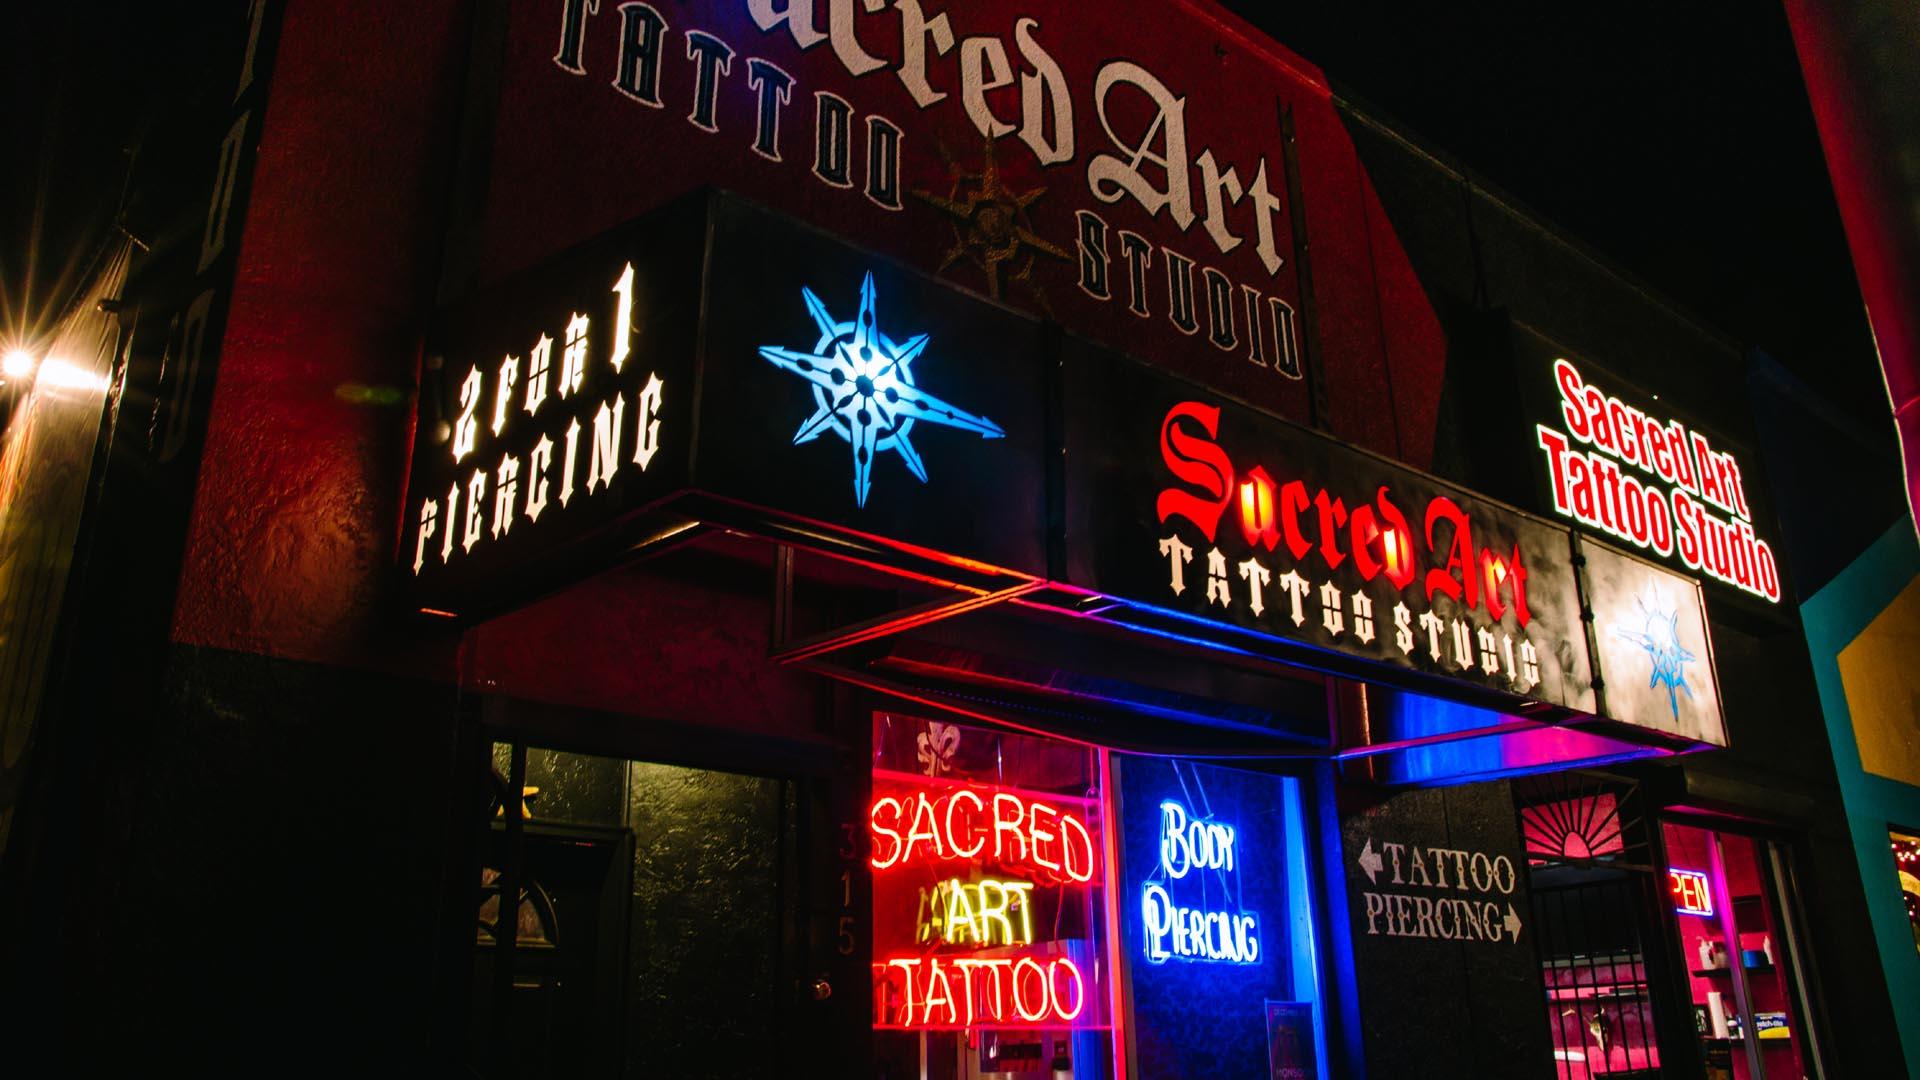 Sacred Art Tattoo Studio